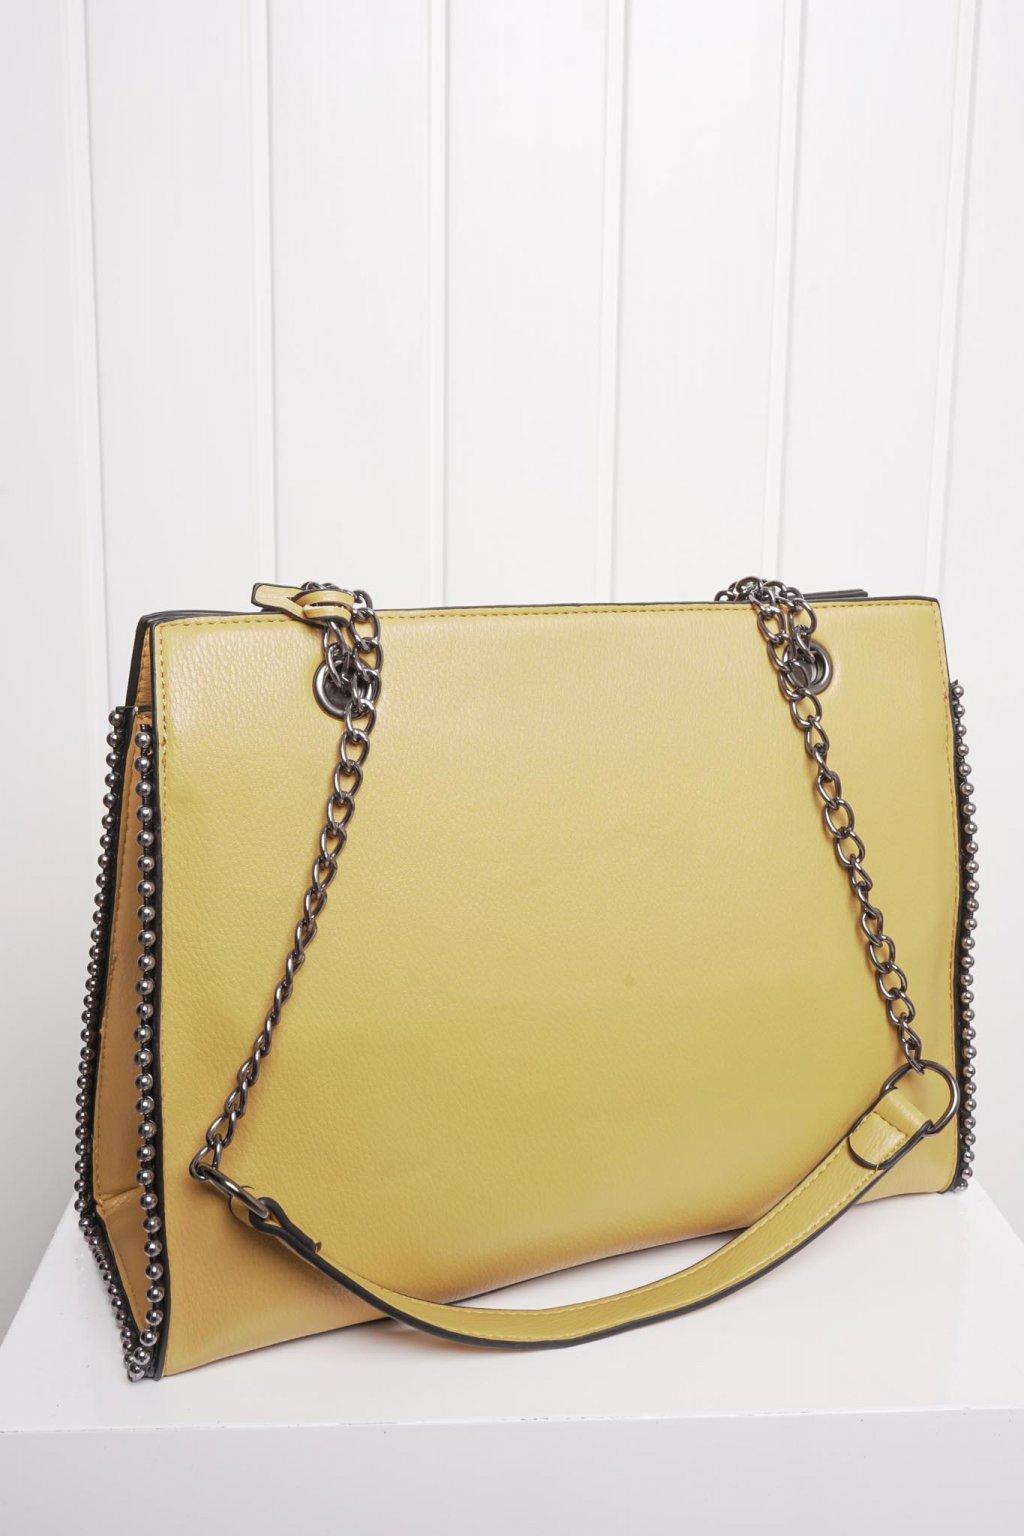 Kabelka, ruksak, dobrá cena, čierna kabelka, čierny ruksak, basic, kabelky, ruksaky 097